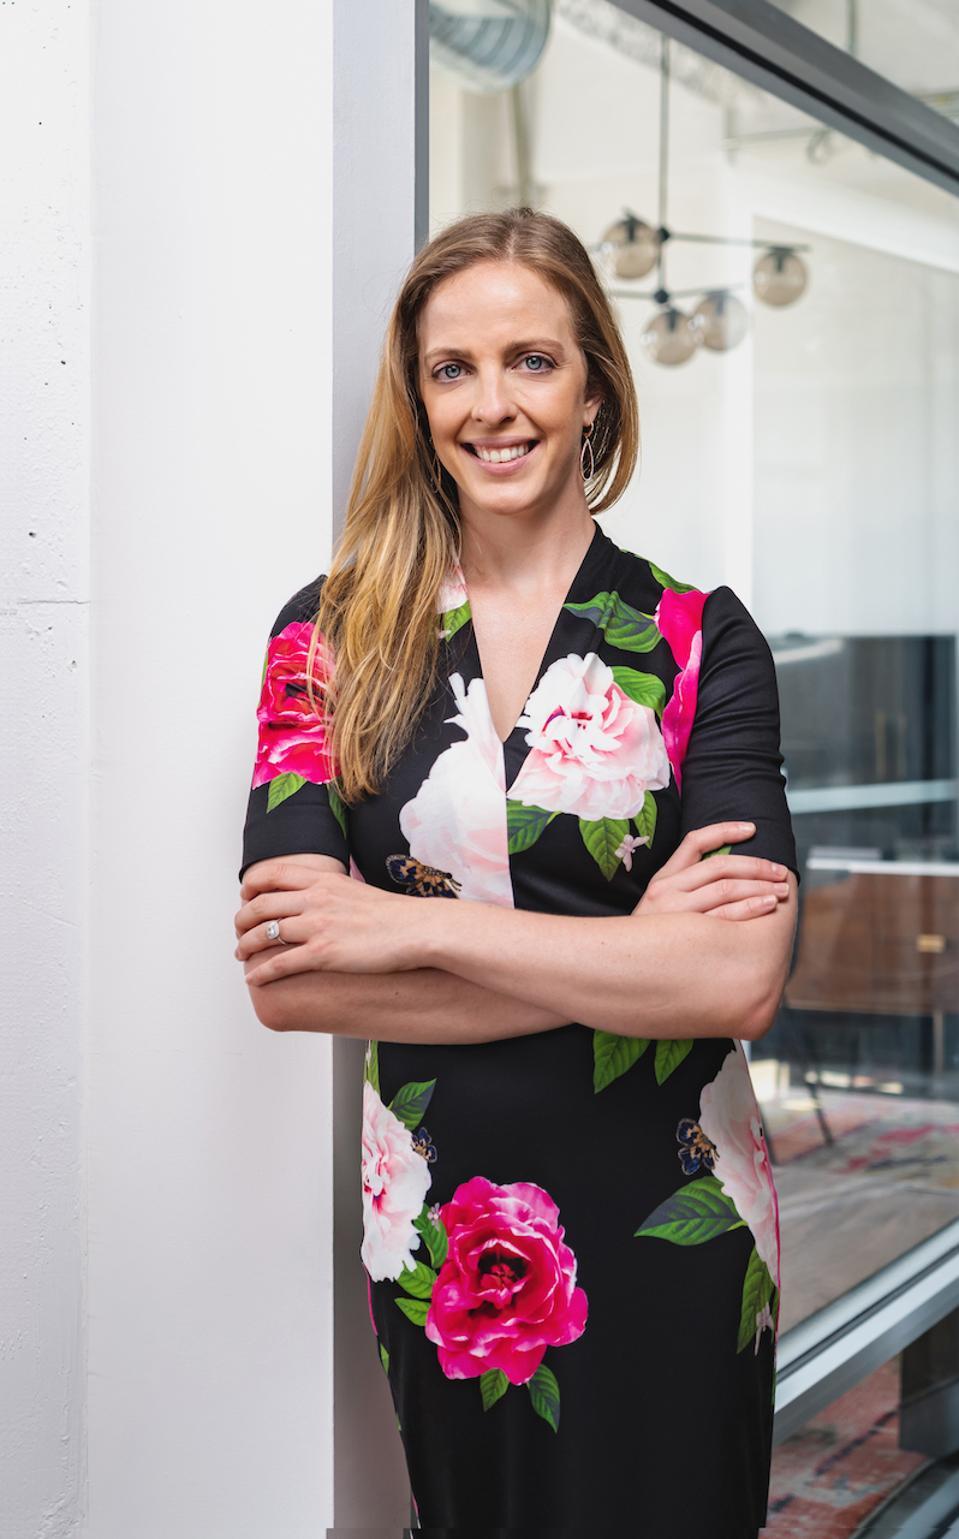 Allison Kopf, CEO of Artemis